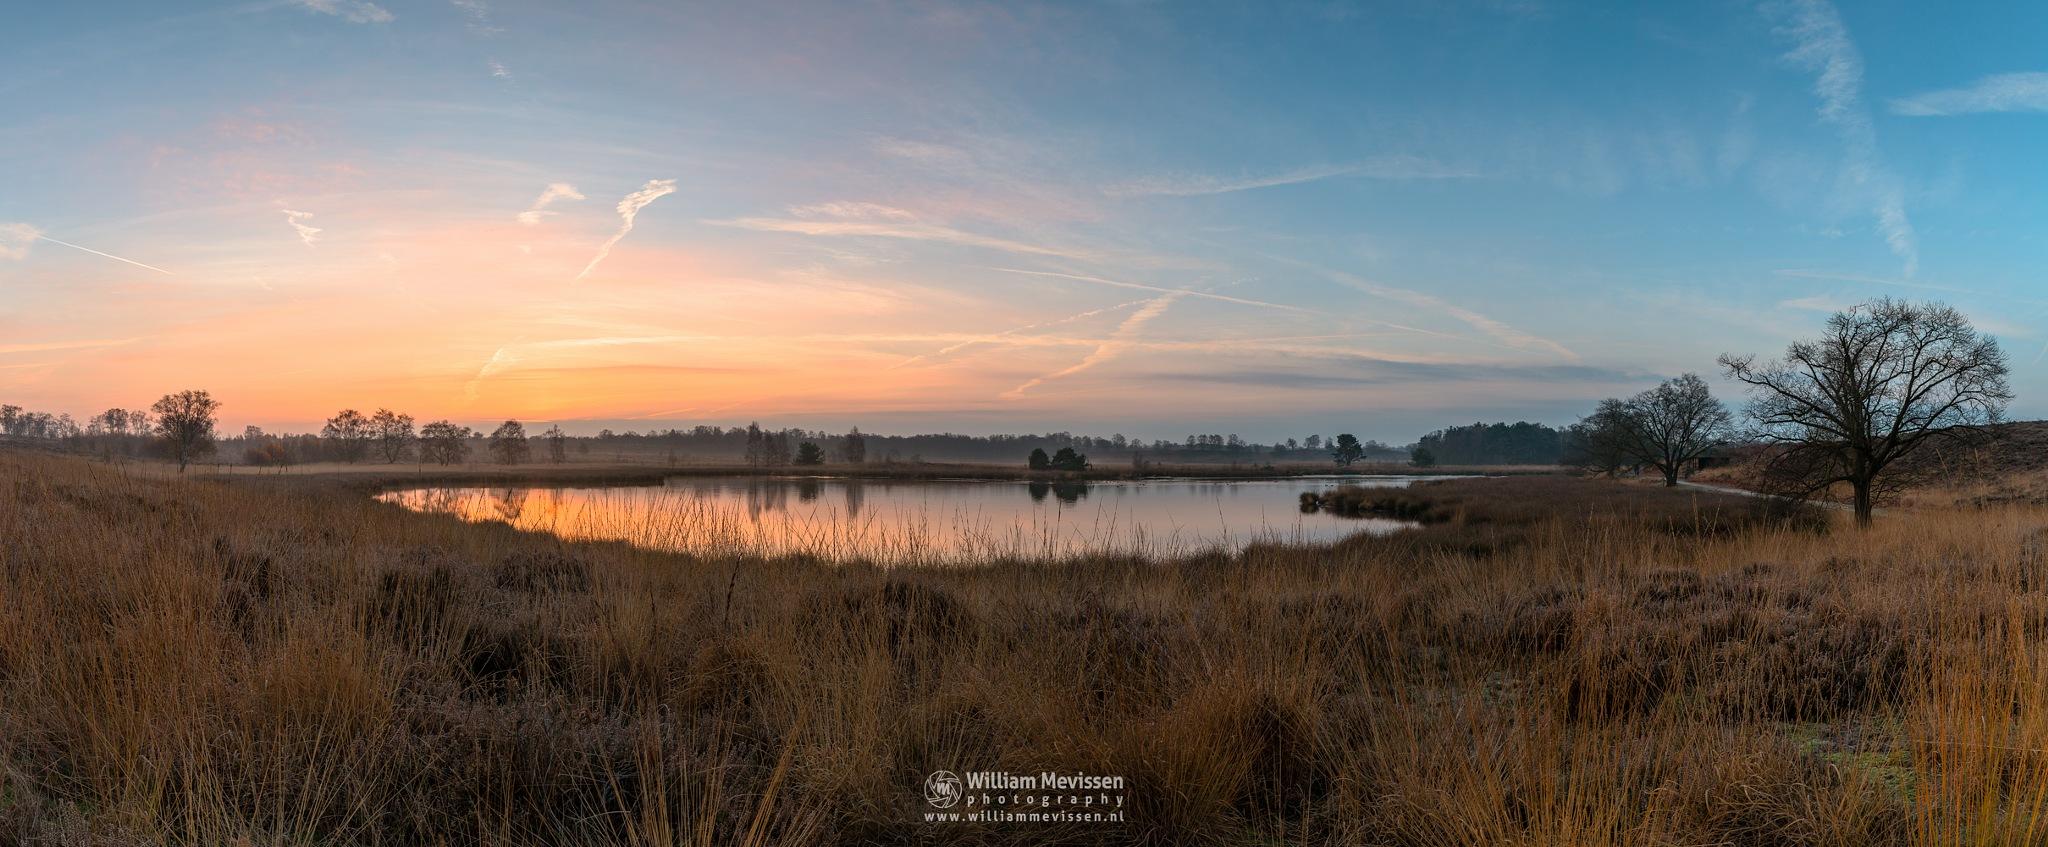 Panorama Pikmeeuwenwater by William Mevissen